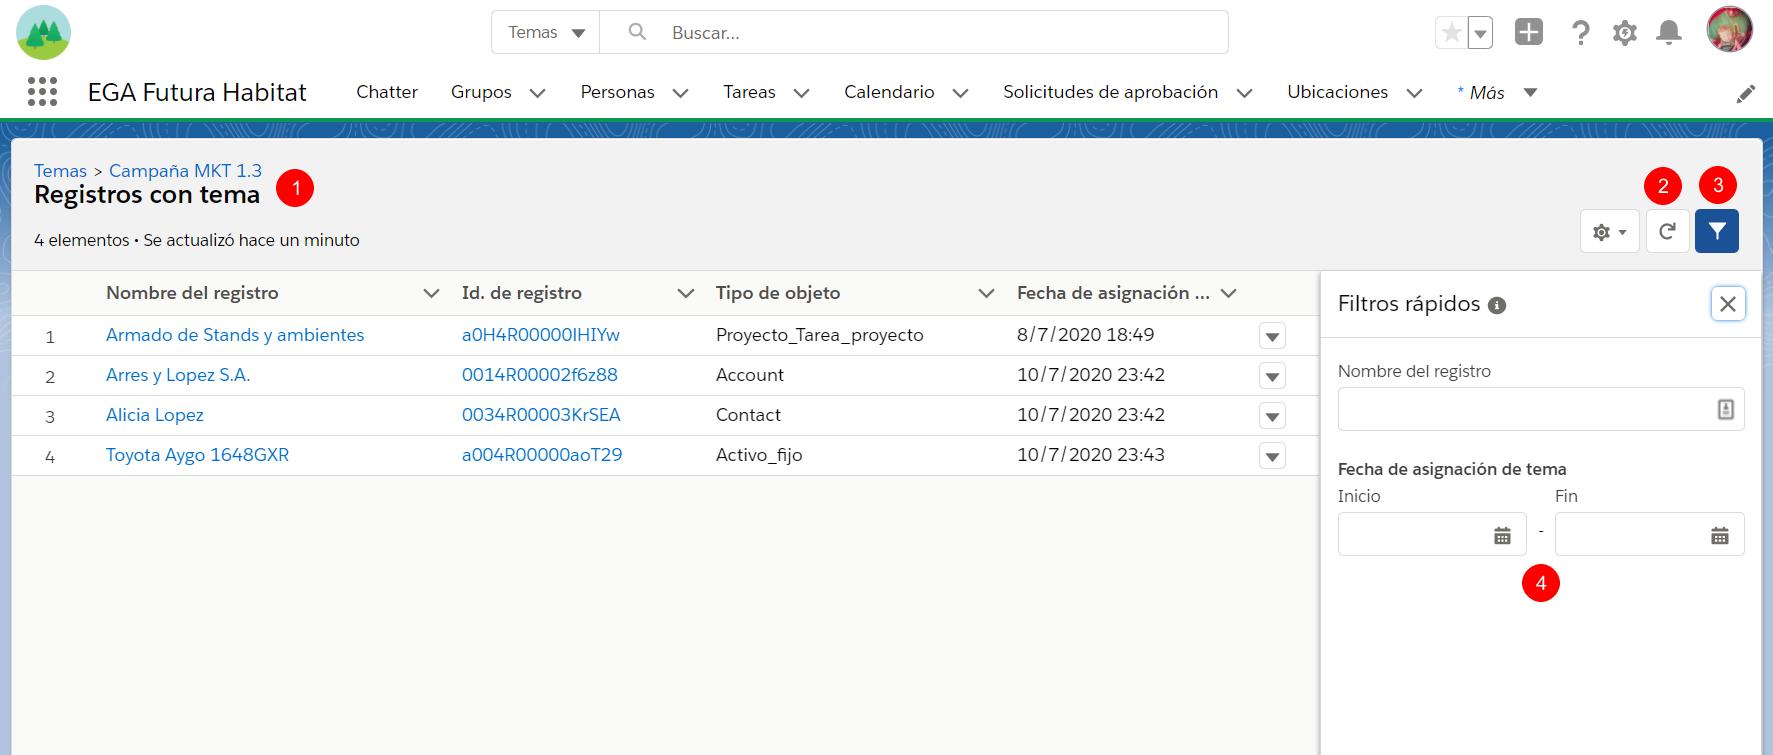 Lista registros con tema hashtag EGA Futura ERP nube